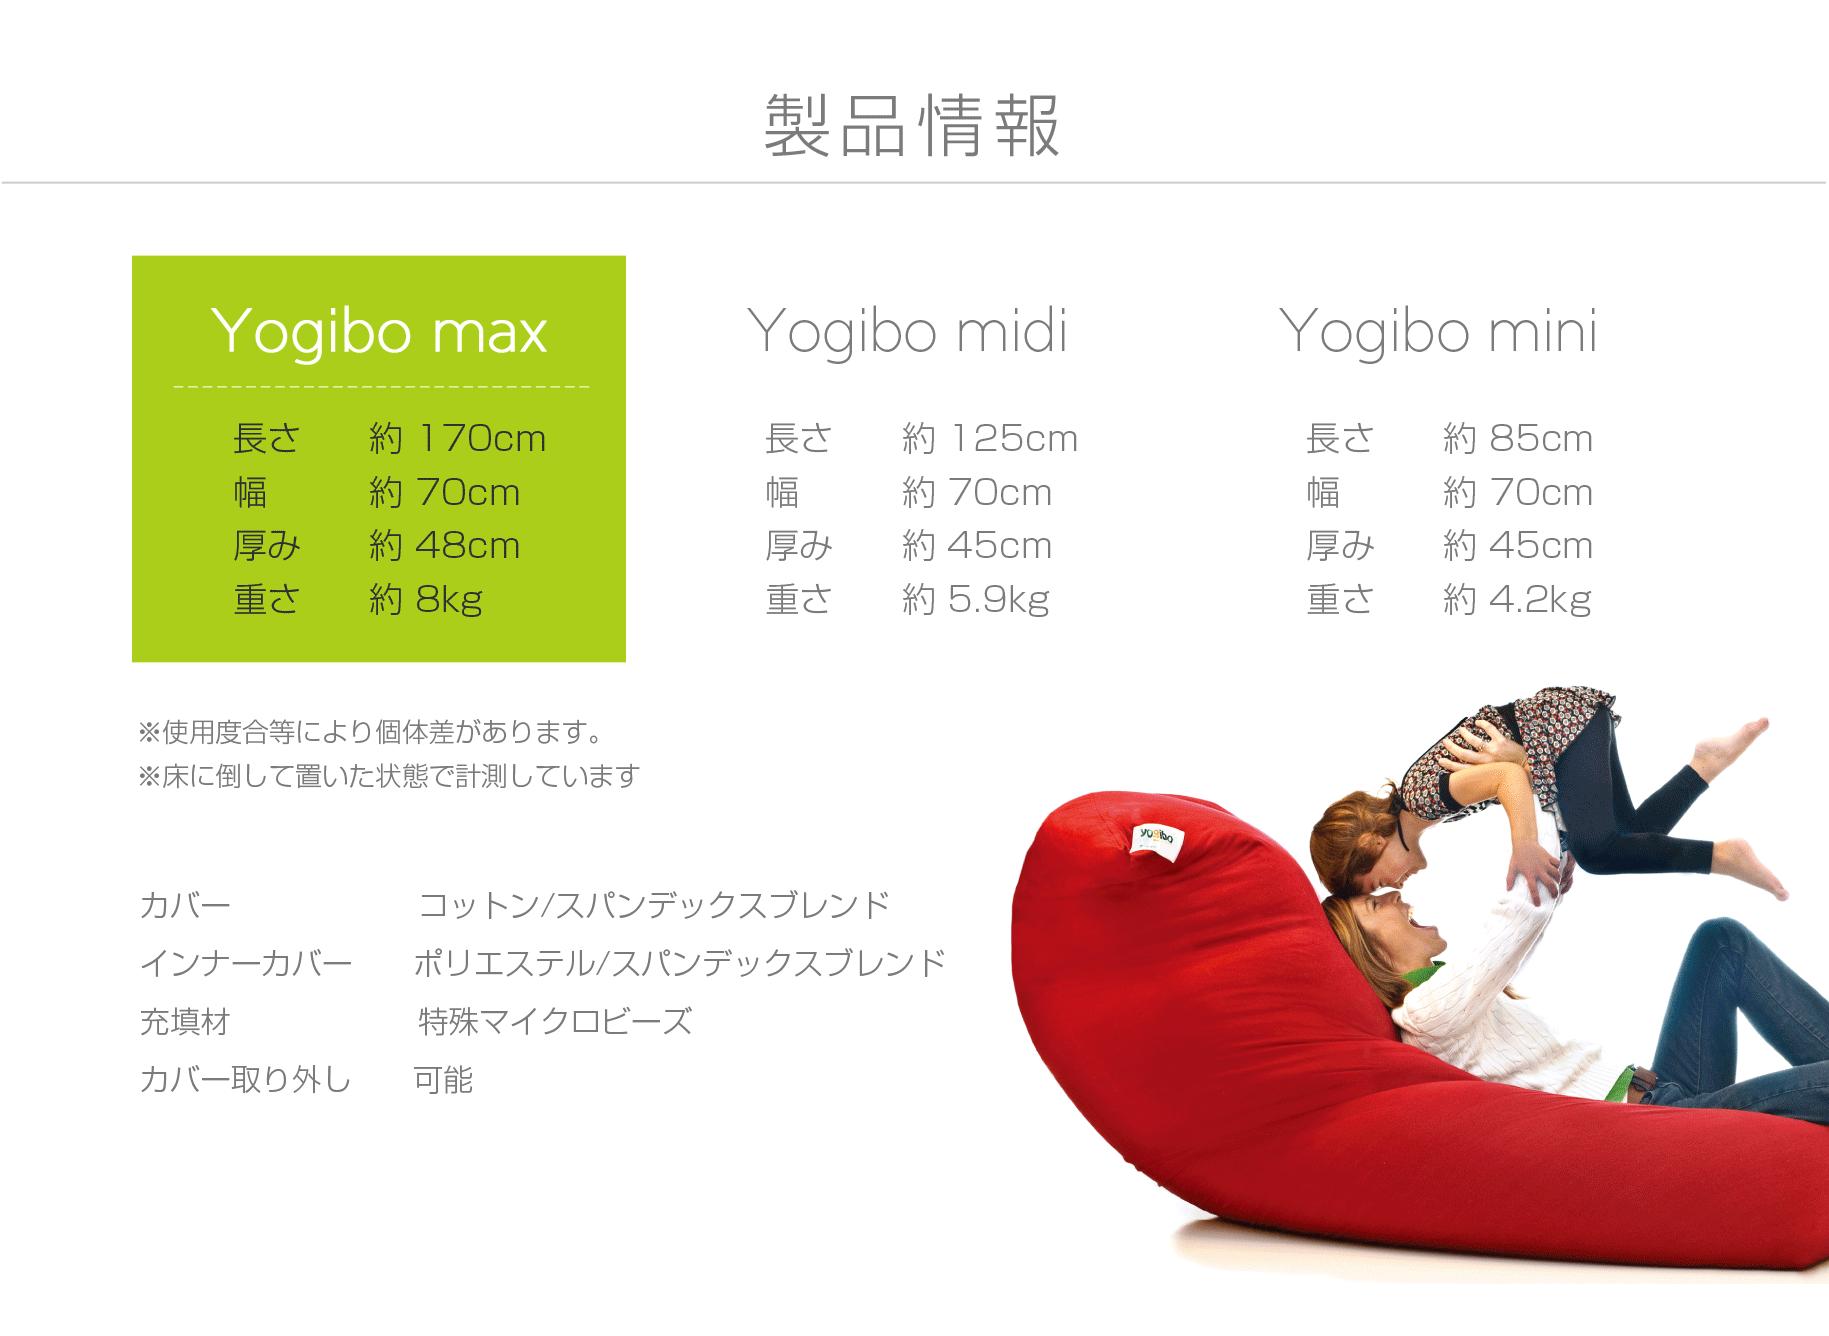 ���ʾ��� Yogibo max Ĺ����170cm ����70cm �����48cm �Ť���8kg